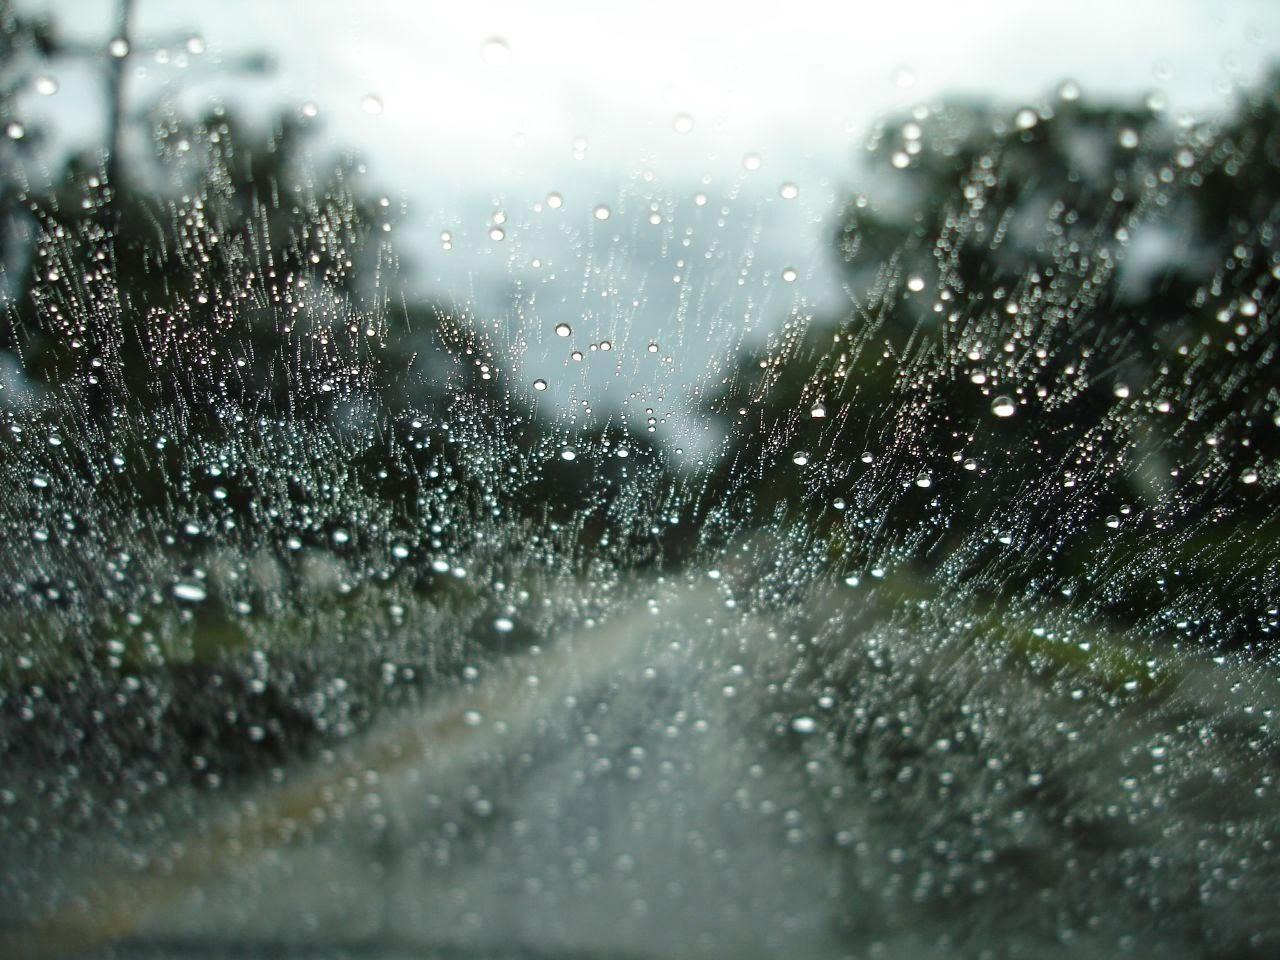 Rainy Day Wallpapers | Full Widescreen Desktop Wallpapers ...